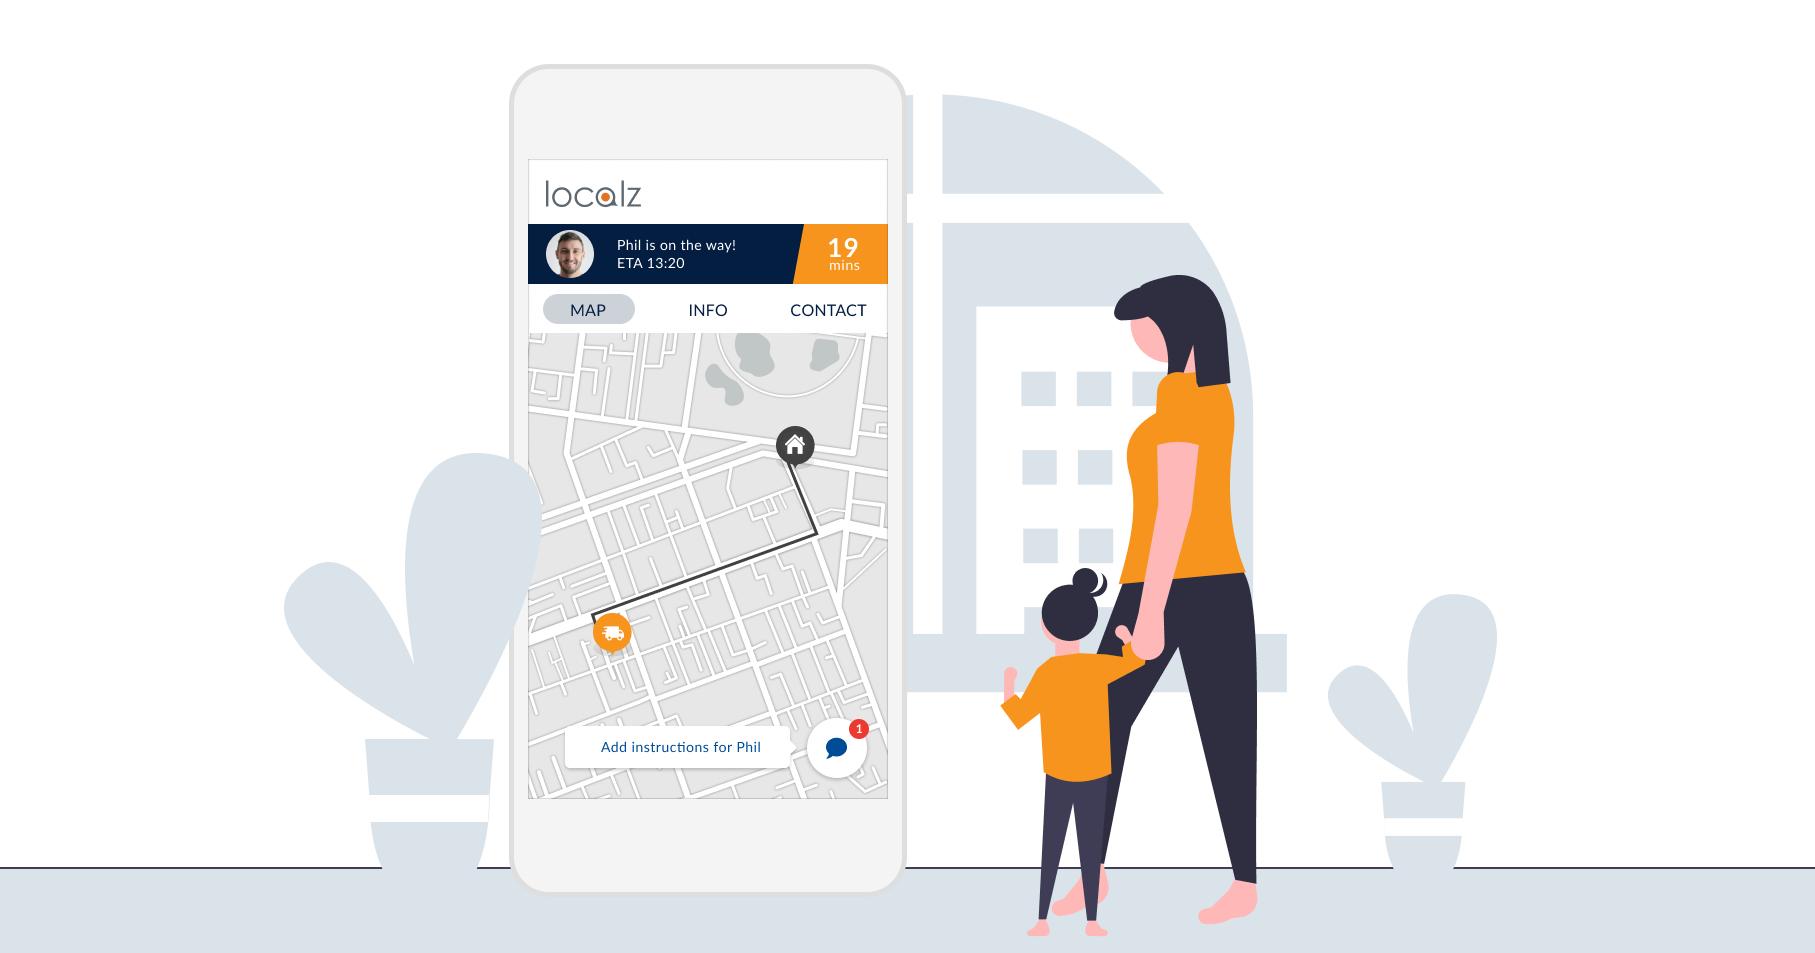 Localz web-based customer portal improves field service customer experience